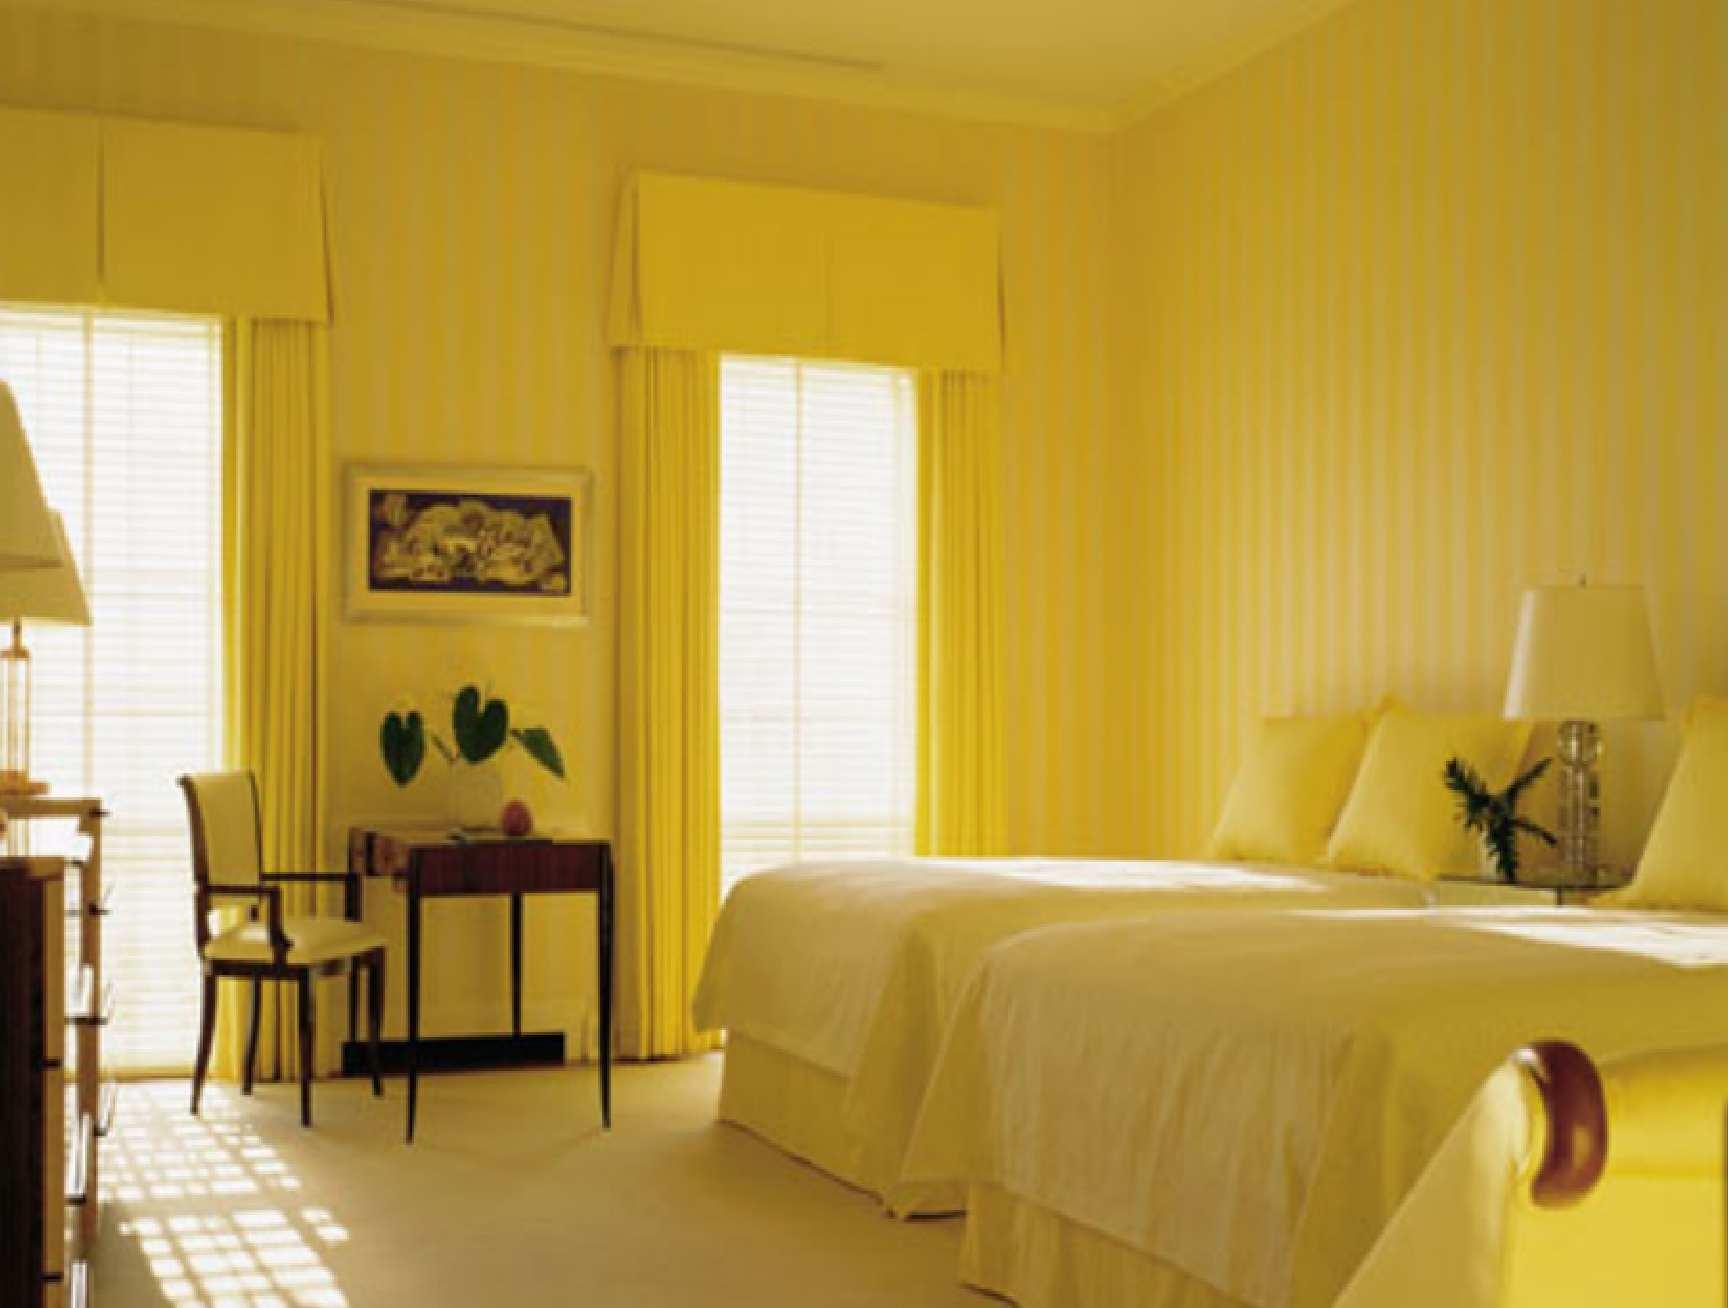 Brilliant Yellow Interior Design Ideas With Extraordinary Bright Yellow Bedroom Ideas Interior Design At Yellow Bedrooms